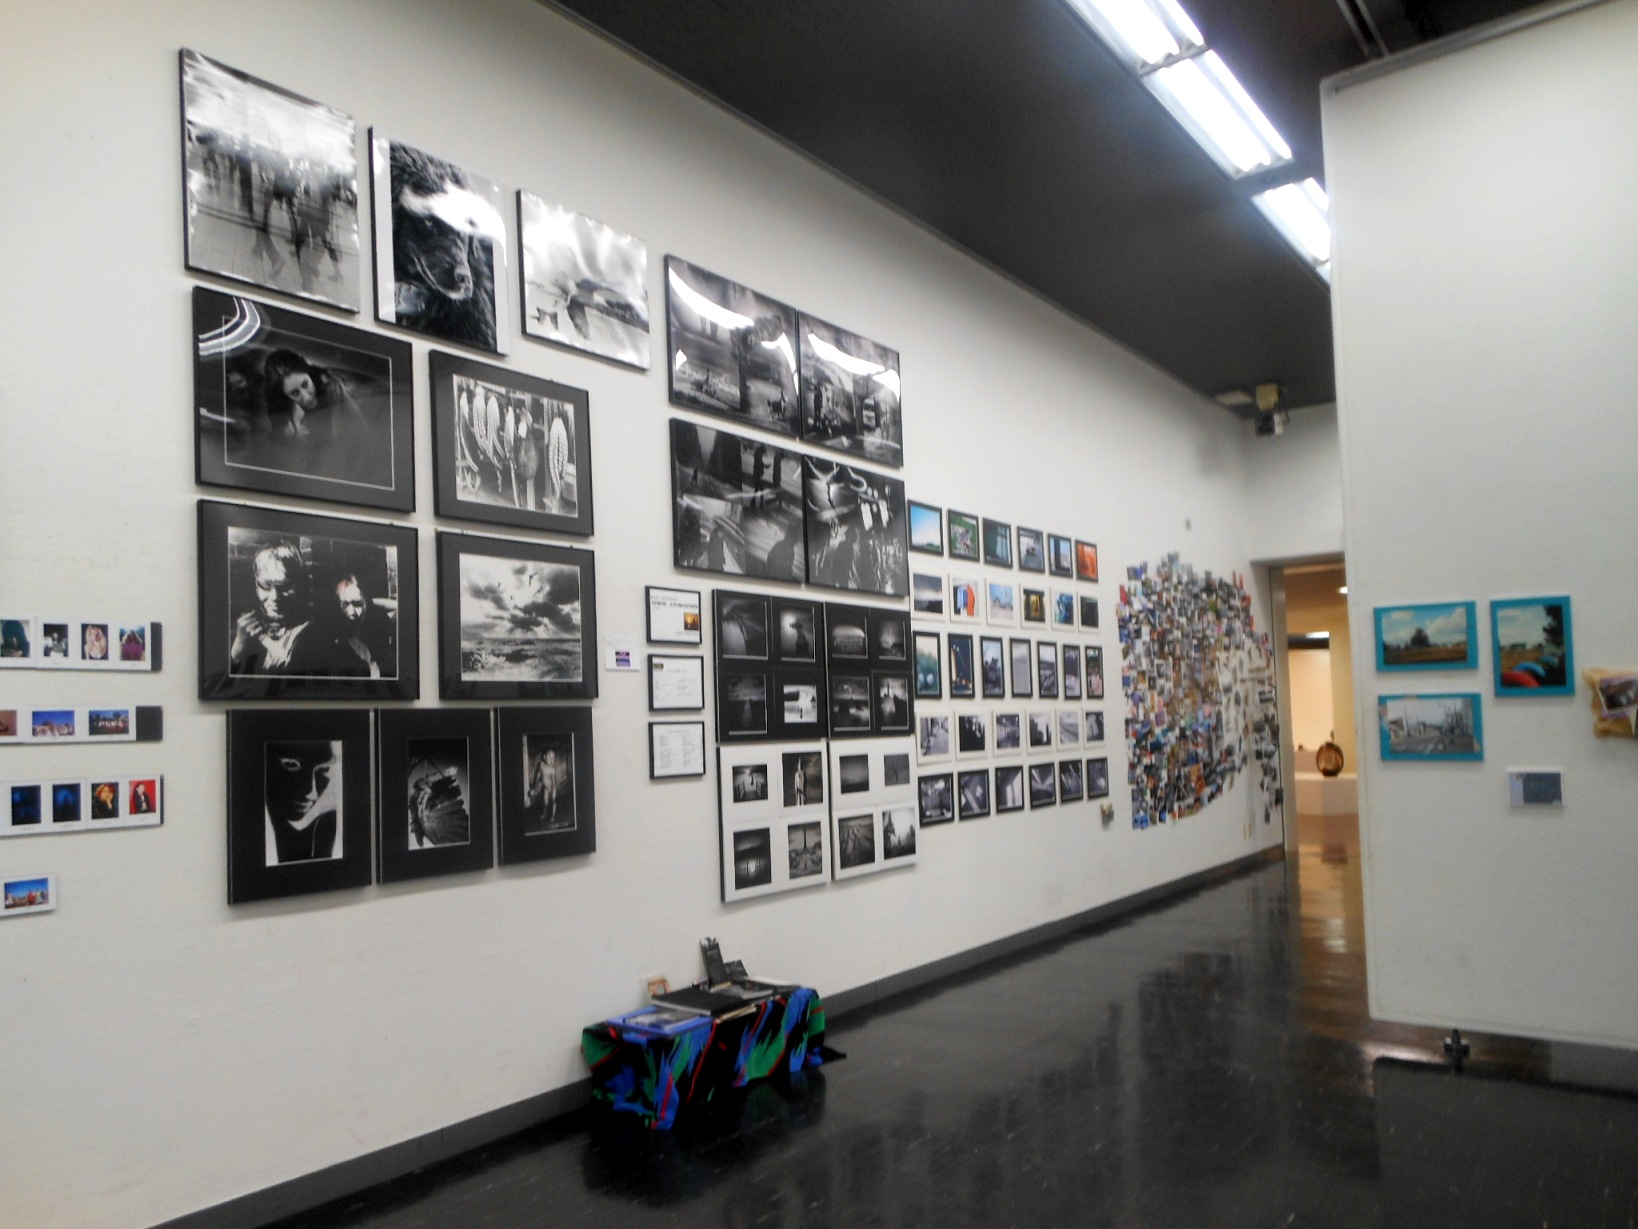 1885)②「写真クラブ「BePHaT!!」 第9回作品展 『夢 Photo 2012』」市民g. 終了11月21日(水)~11月25日(日)_f0126829_21382769.jpg